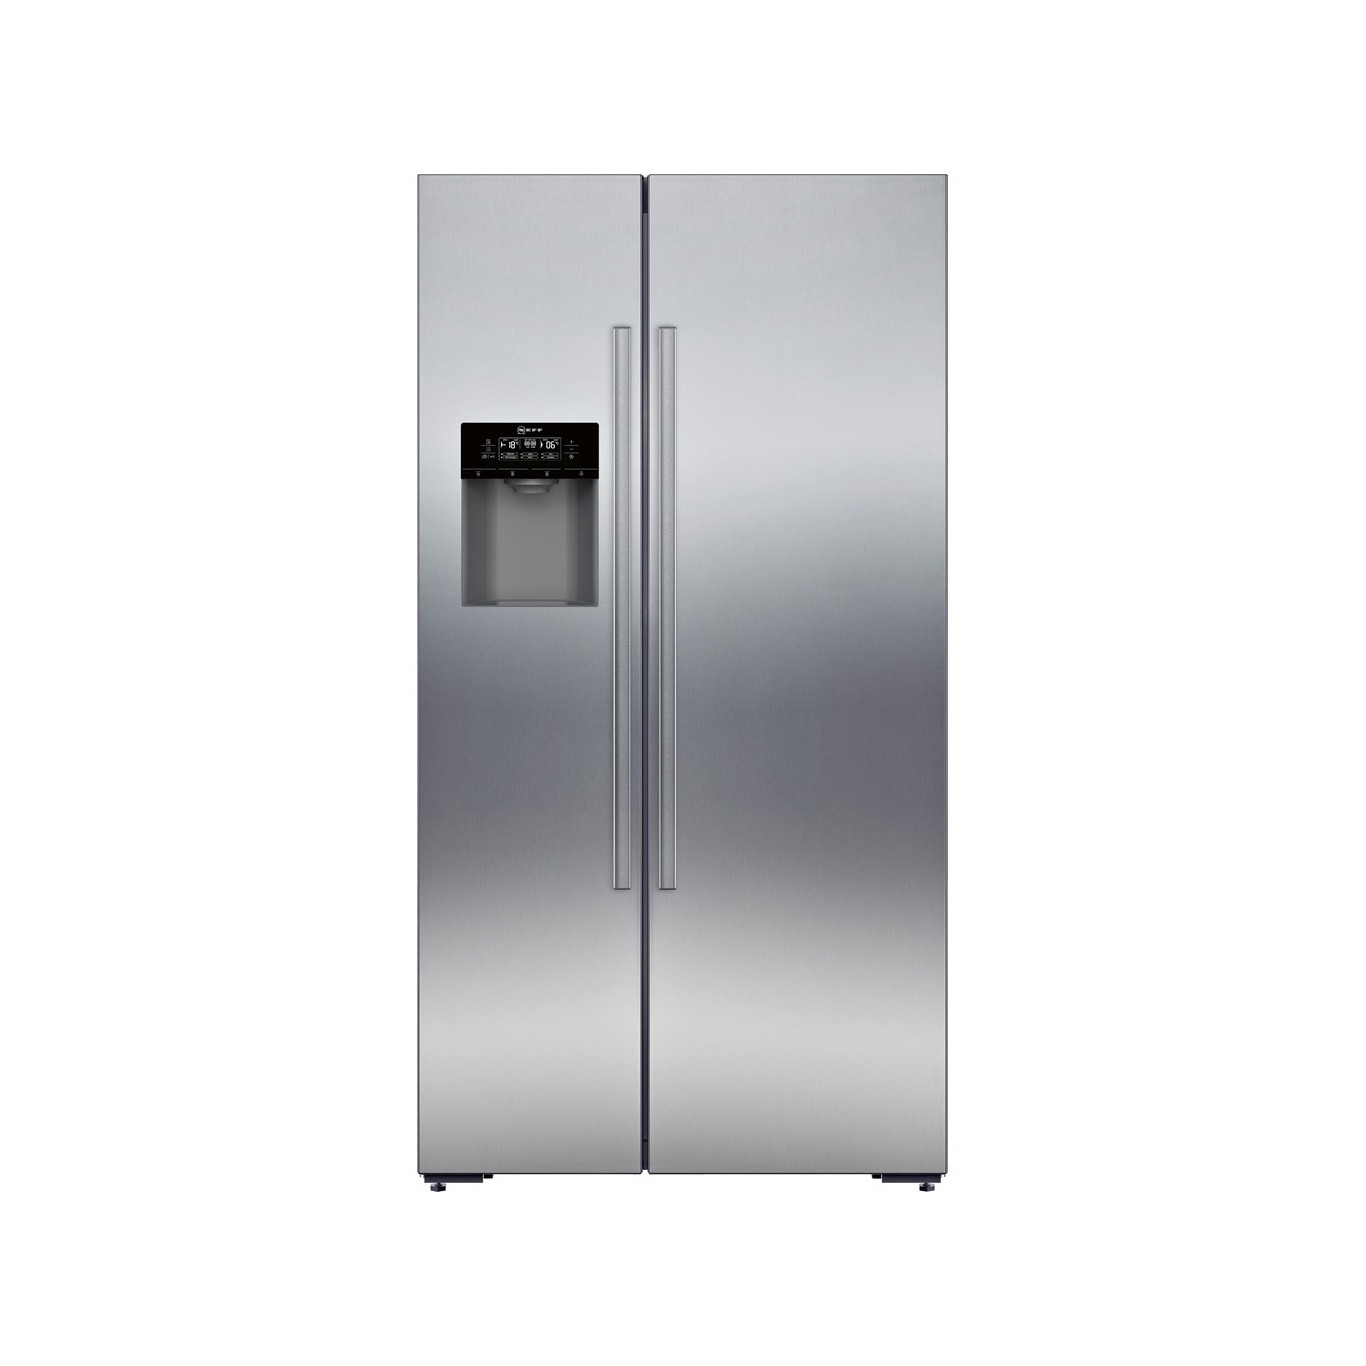 Neff N70 Stainless Steel American Style Fridge Freezer KA3923I20G